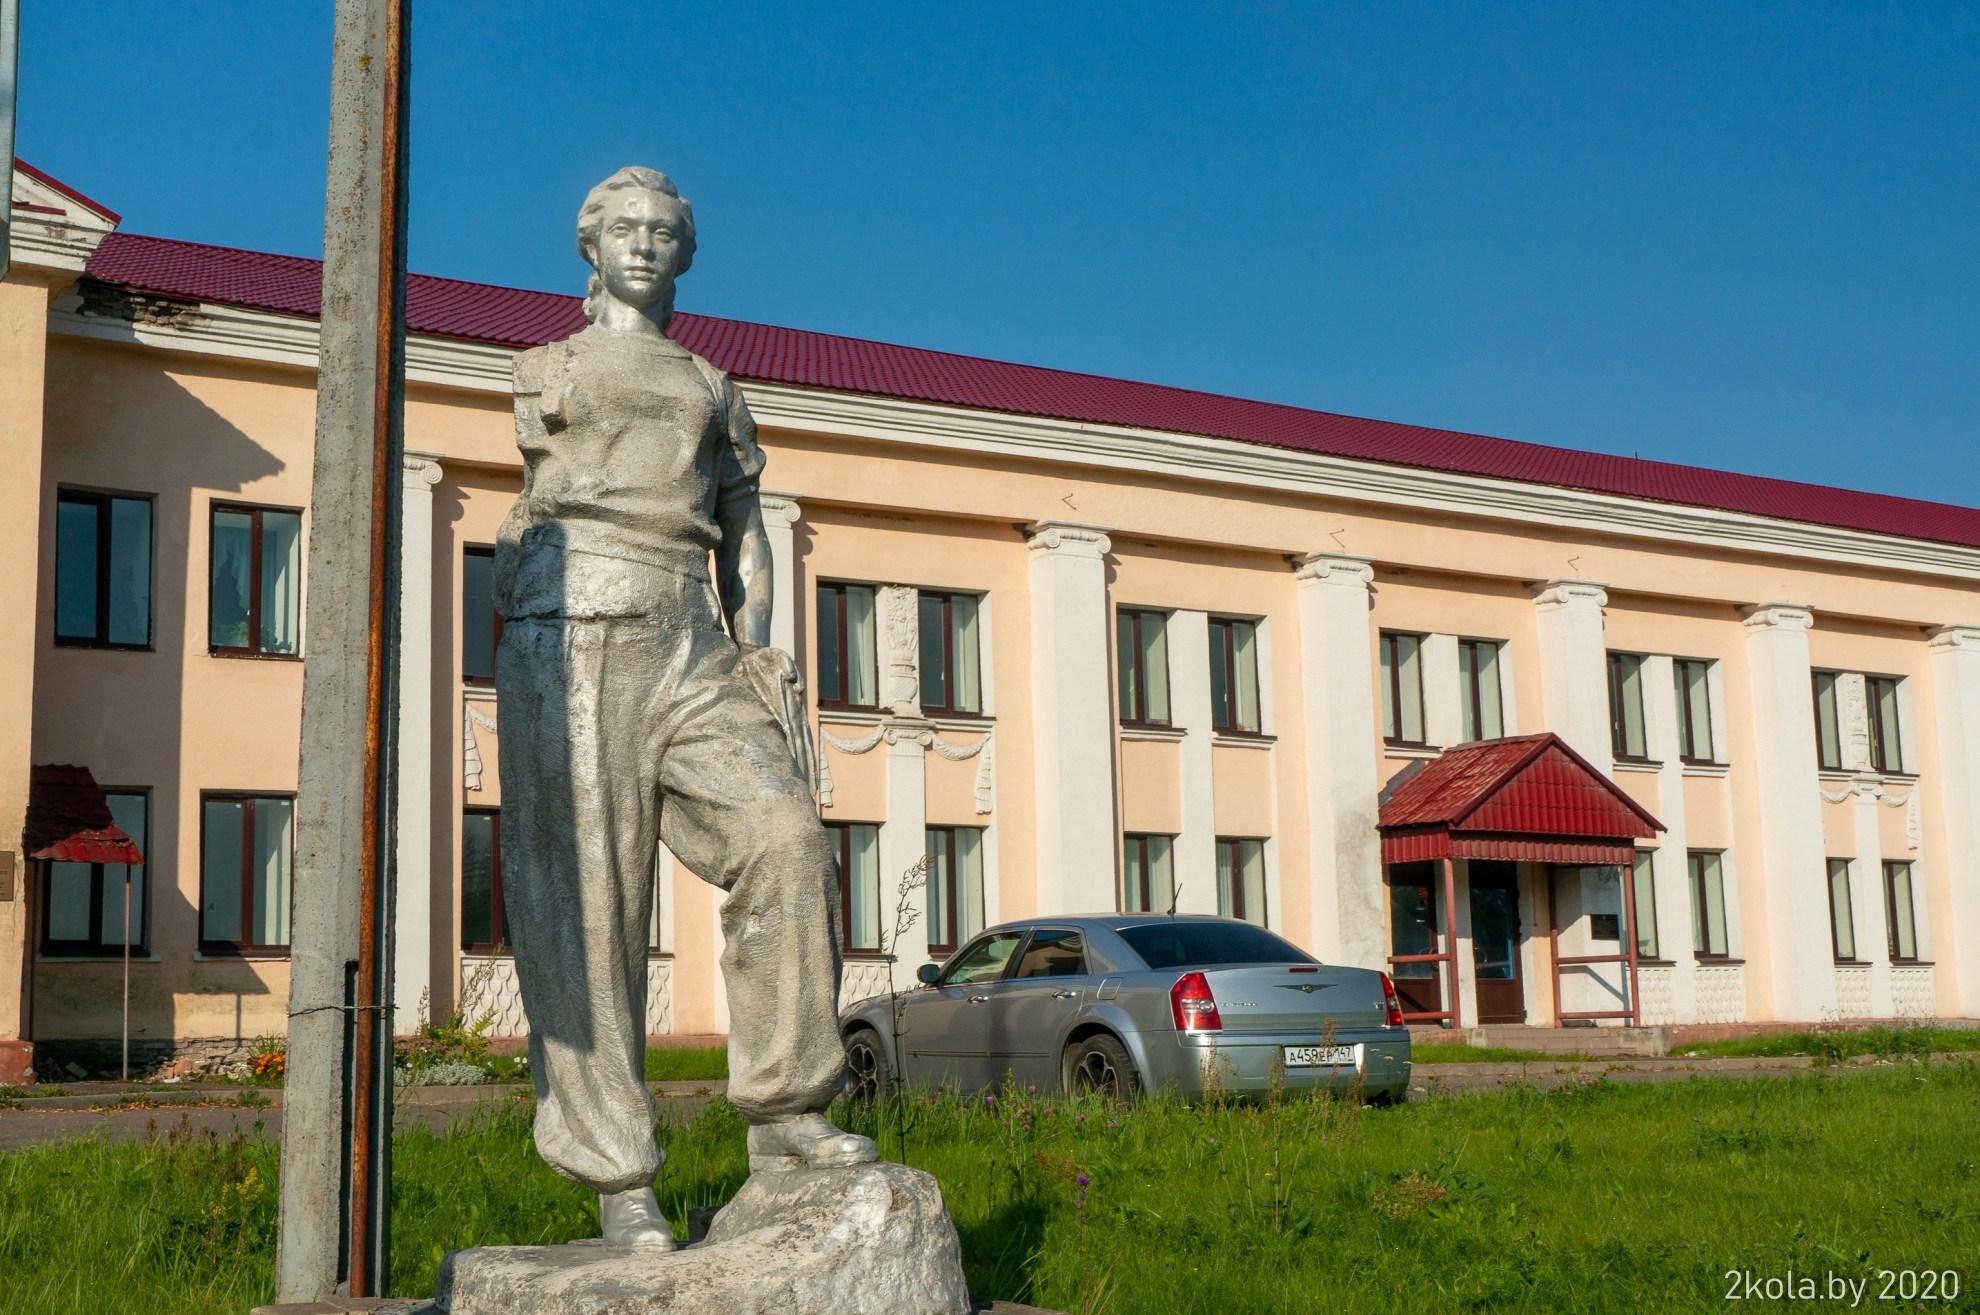 Дом культуры горняков. г. Сланцы